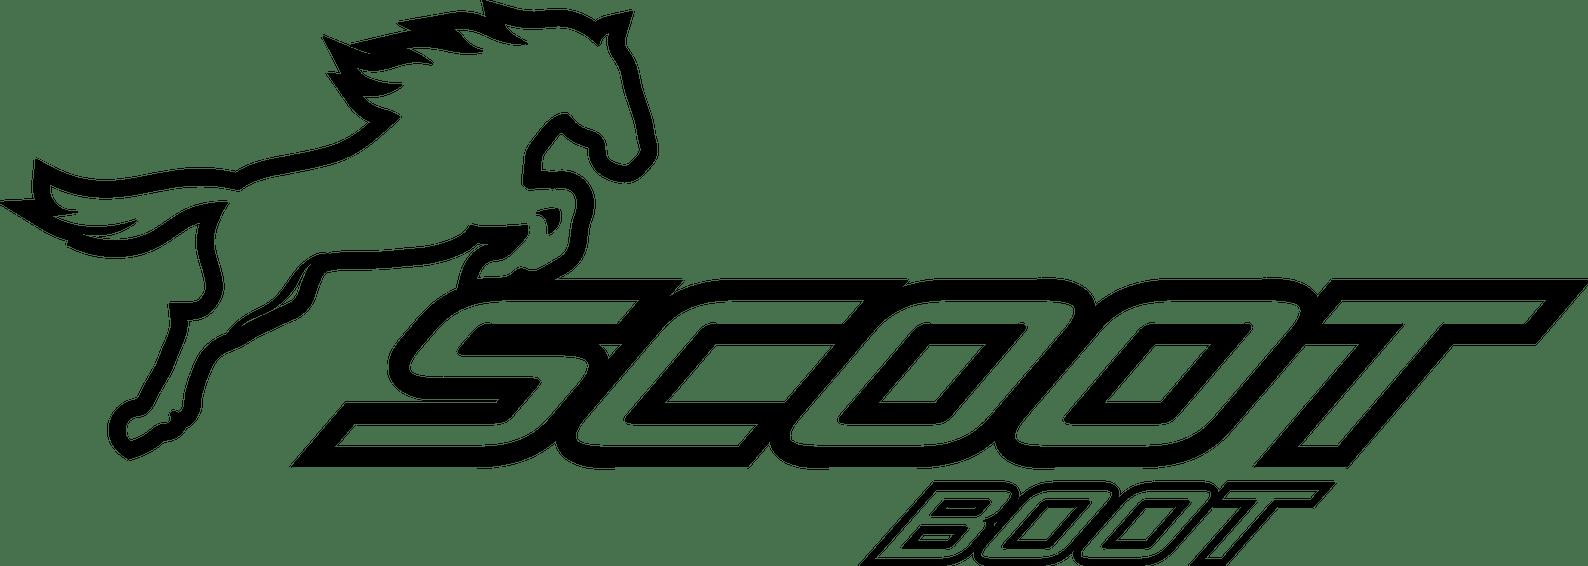 logo scootboot